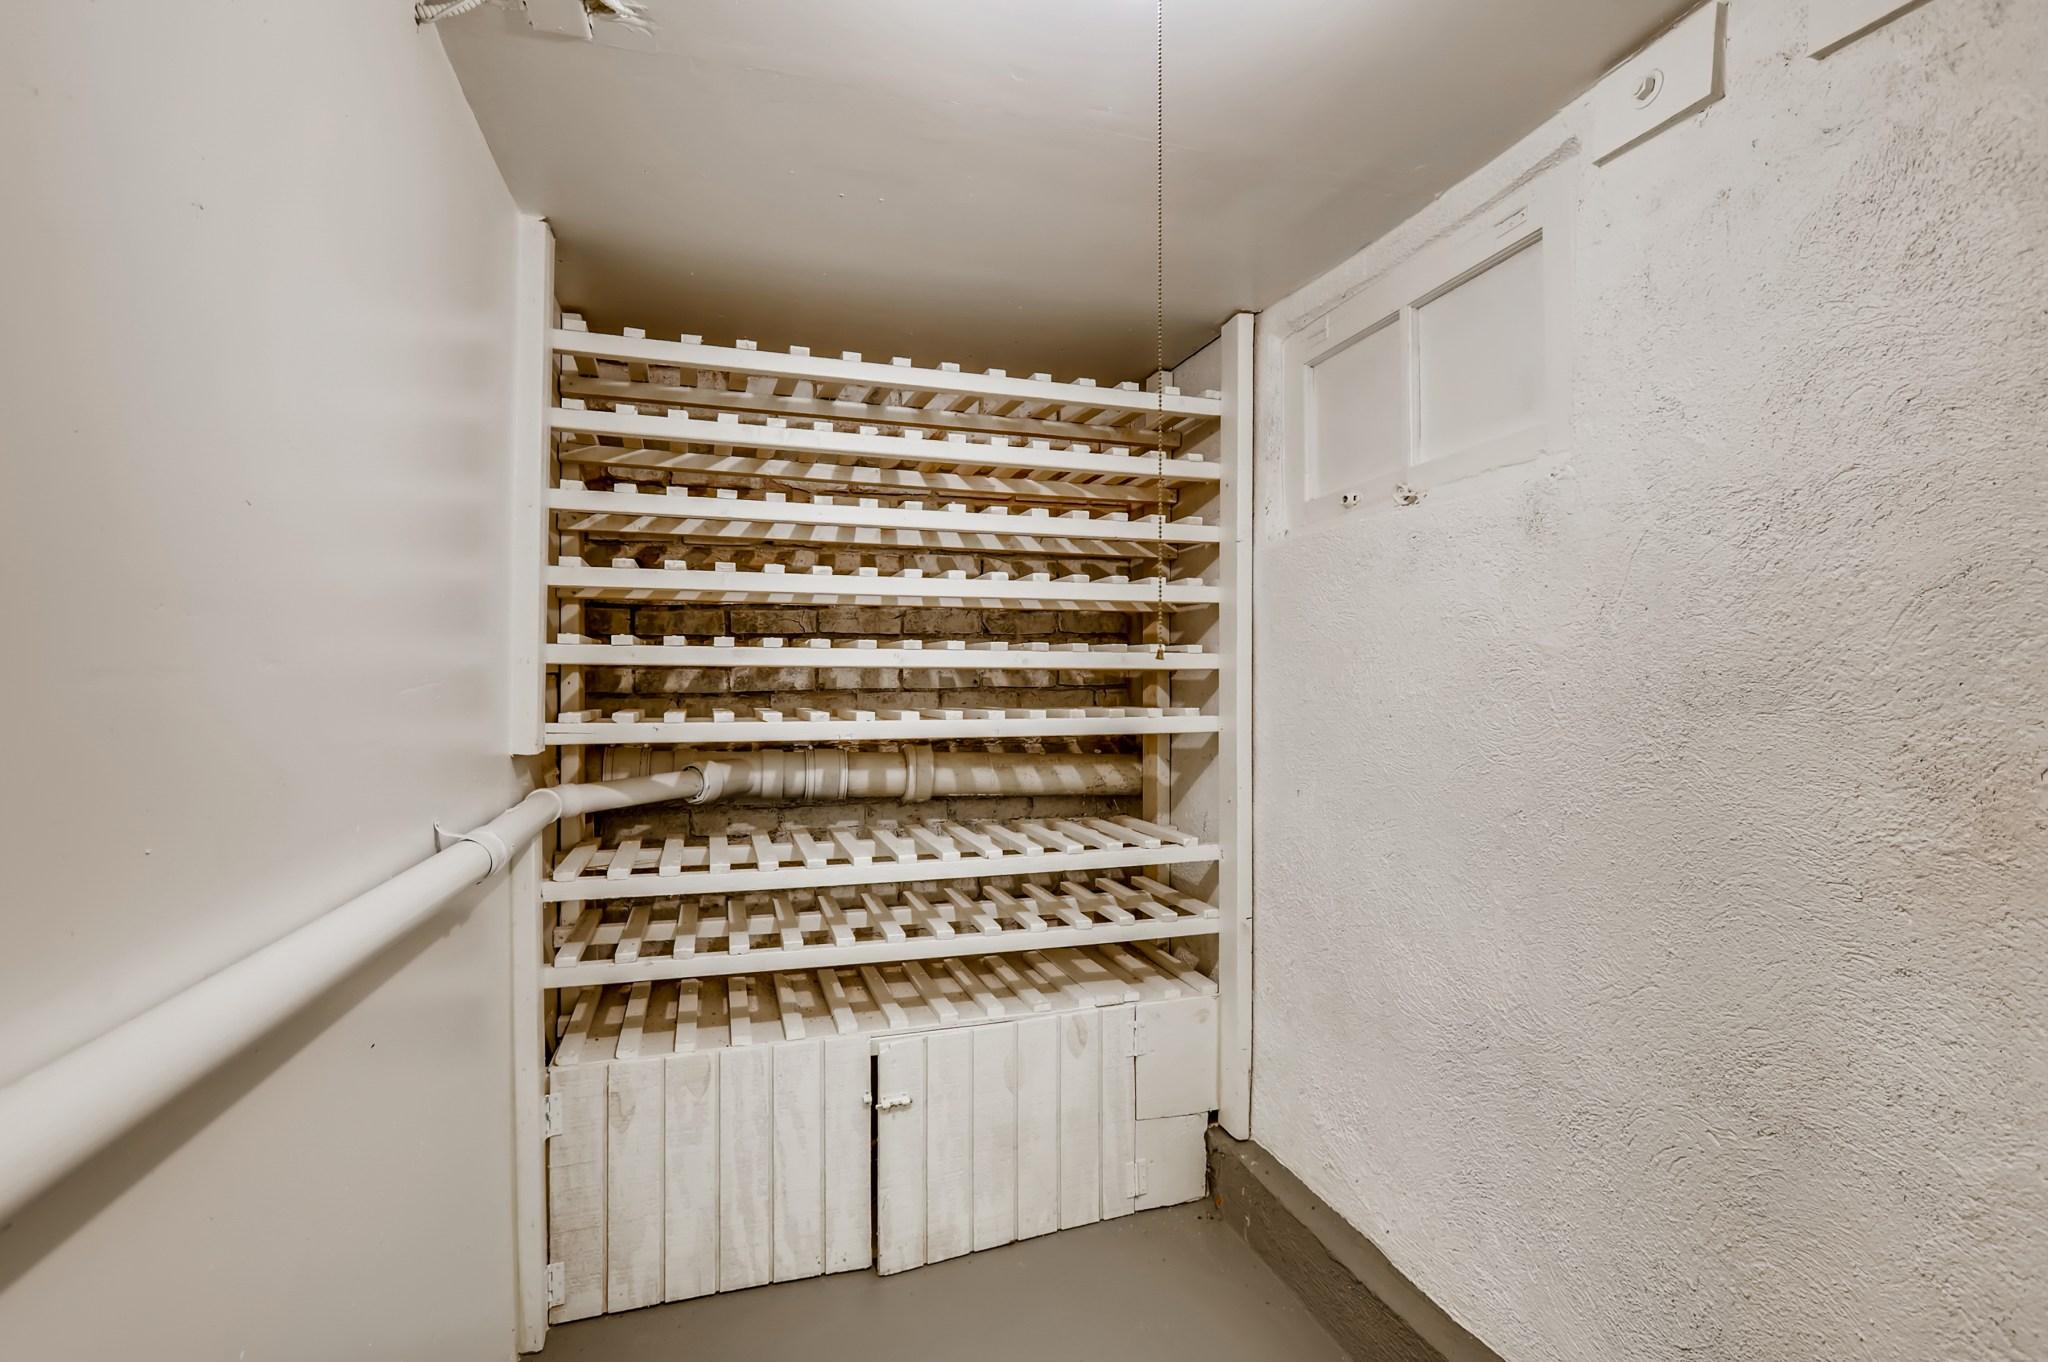 35-Lower-Level-Wine-Cellar